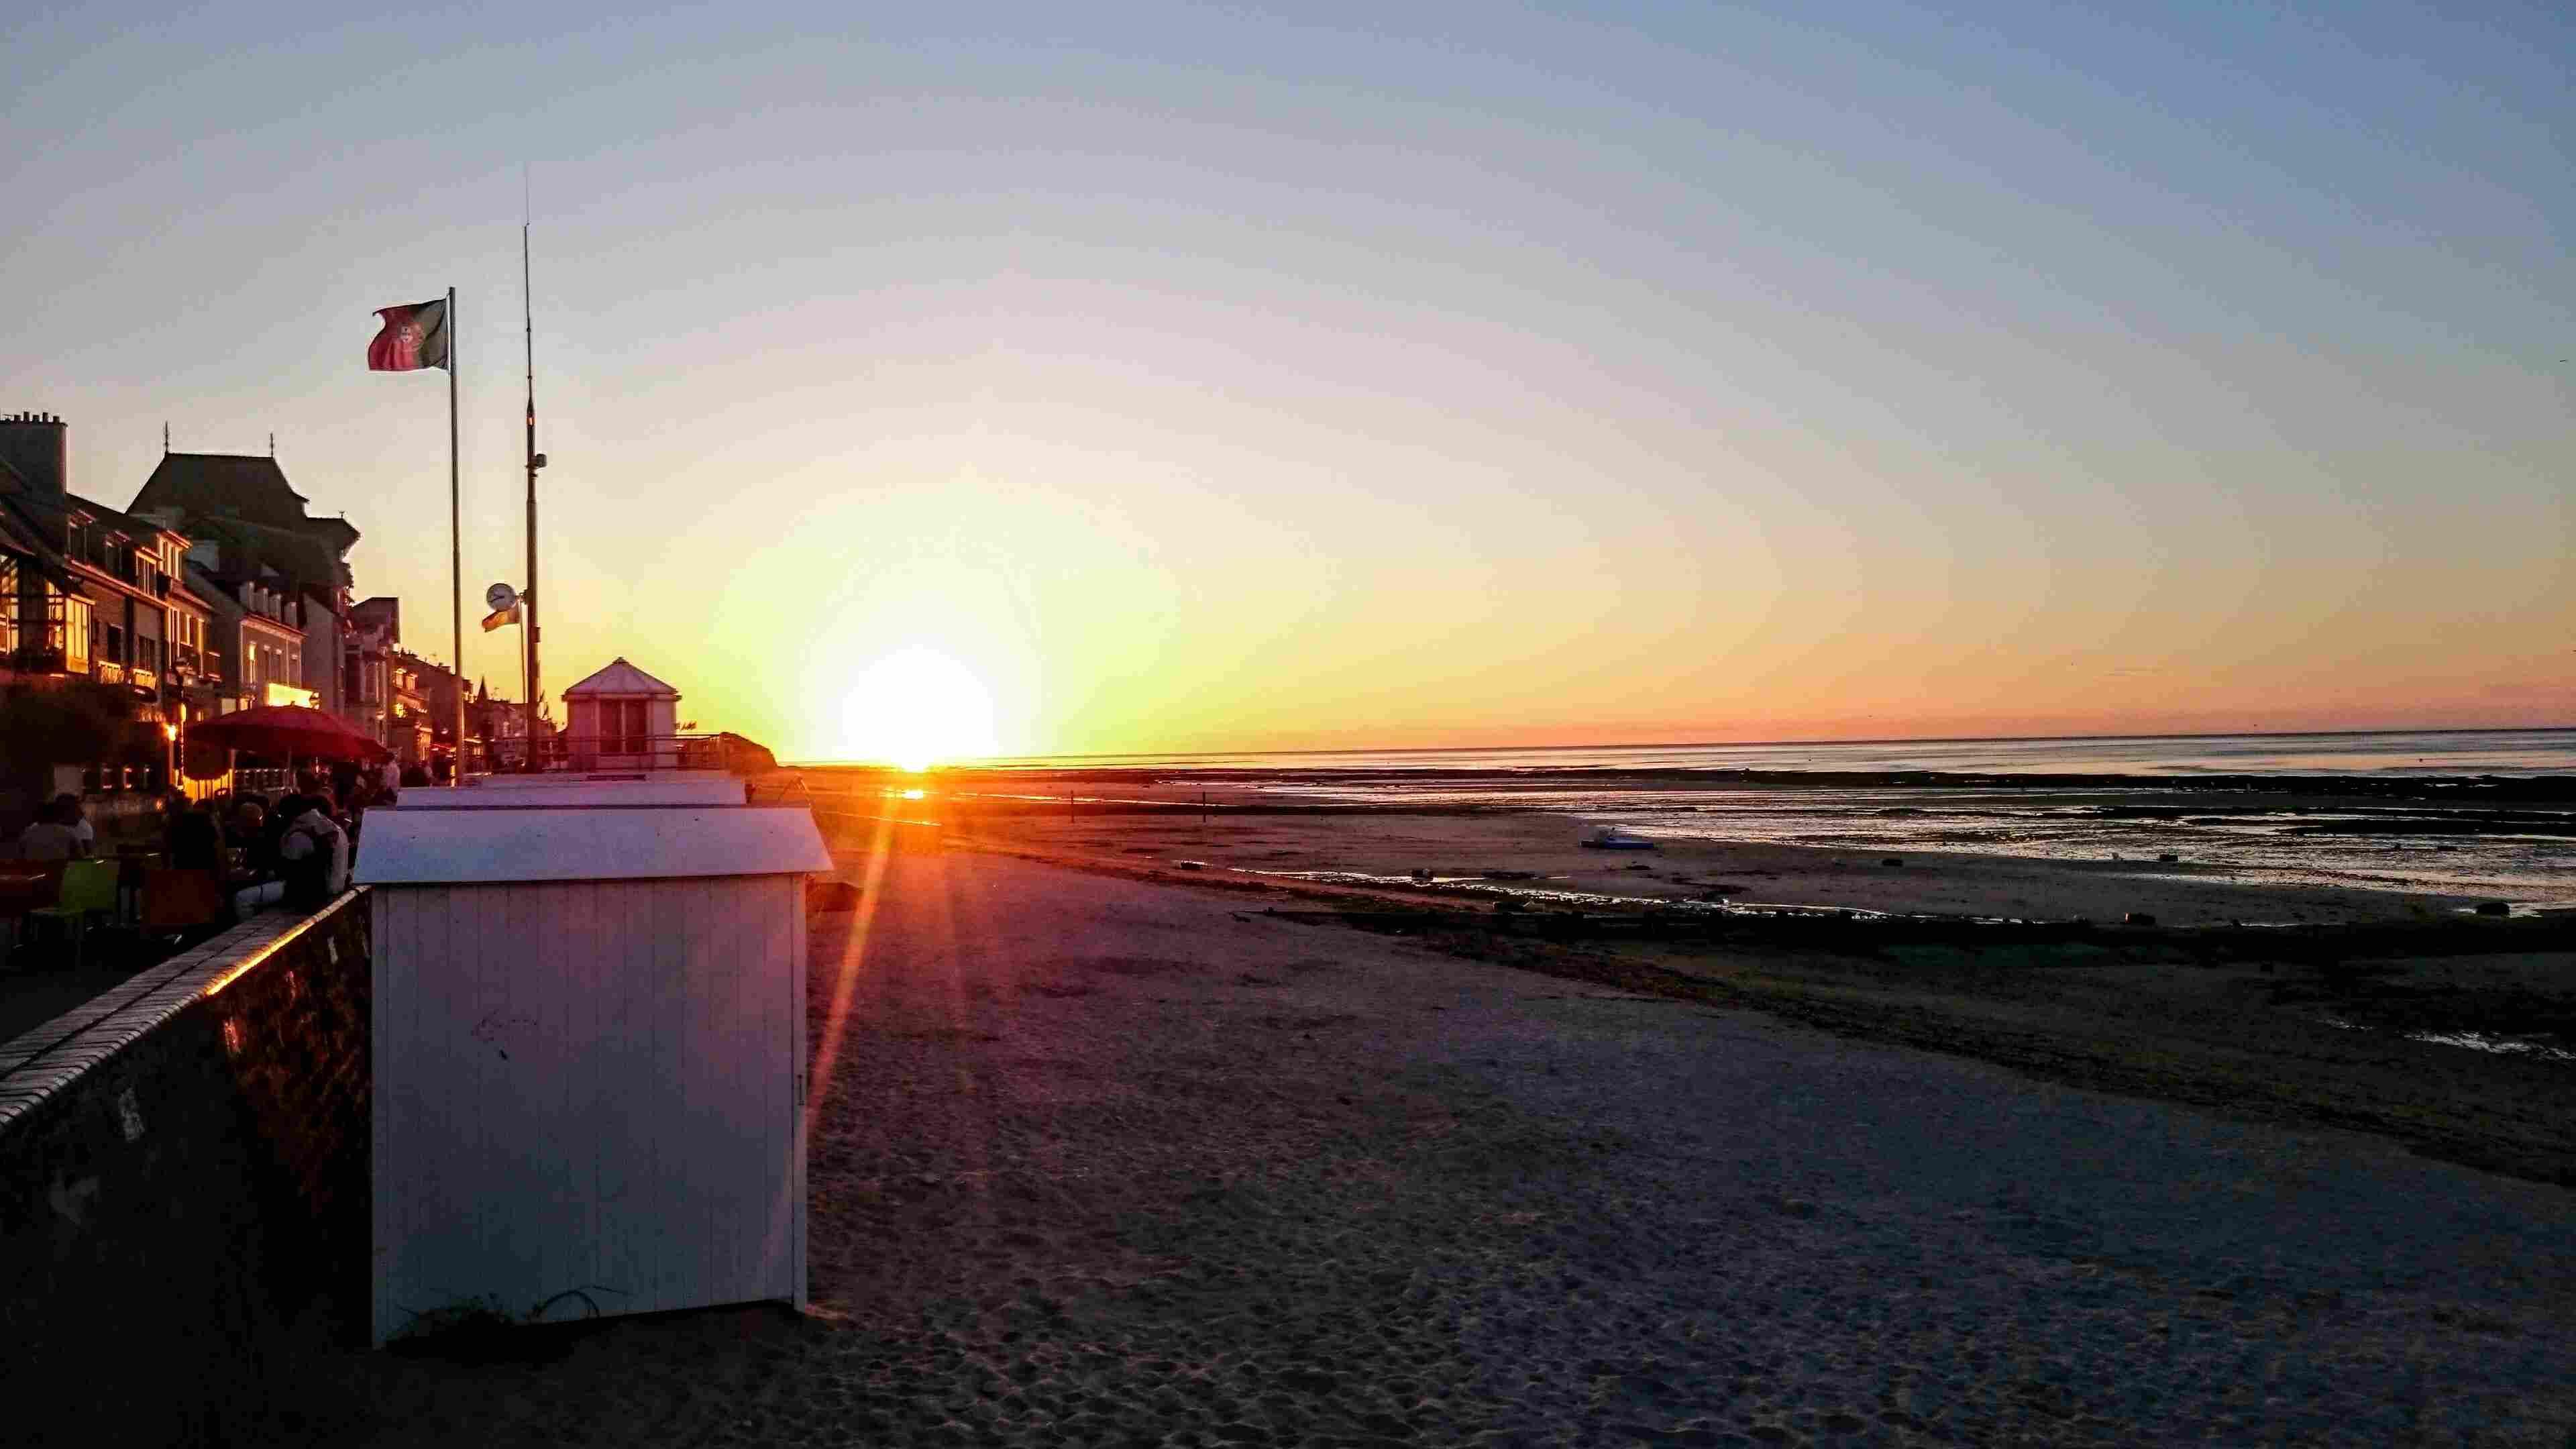 Caen at sunset